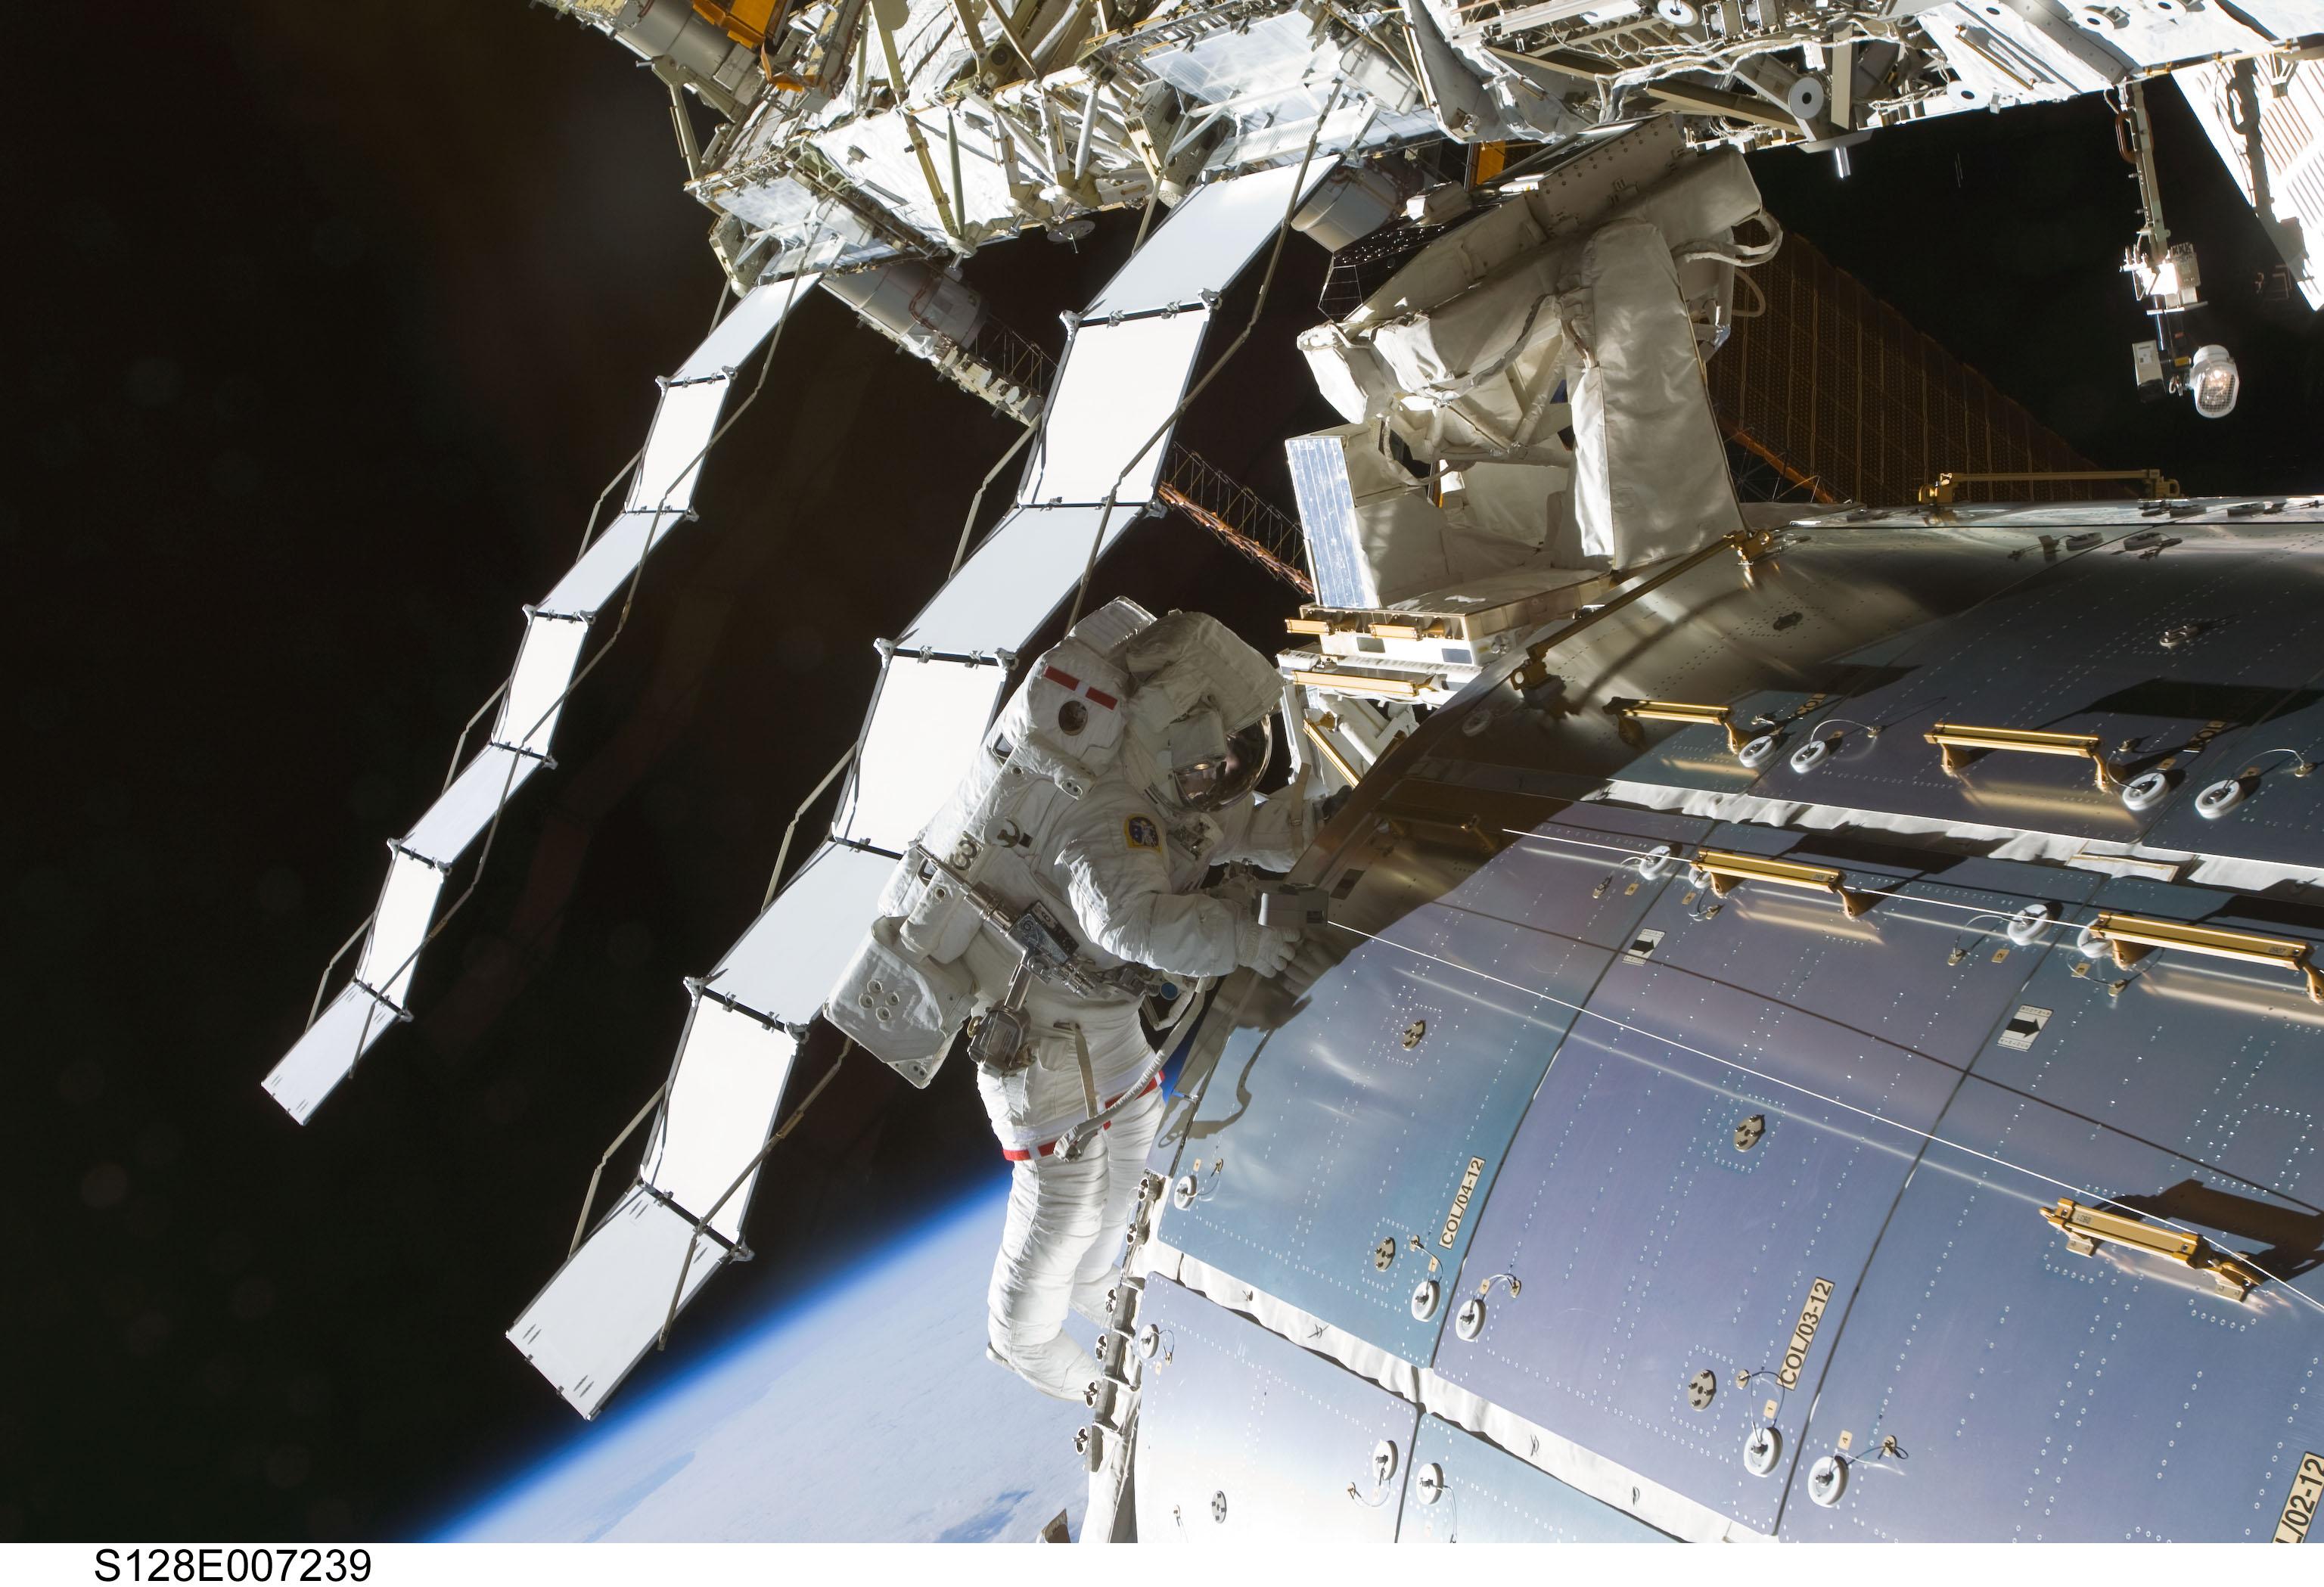 space station ammonia leak - photo #17